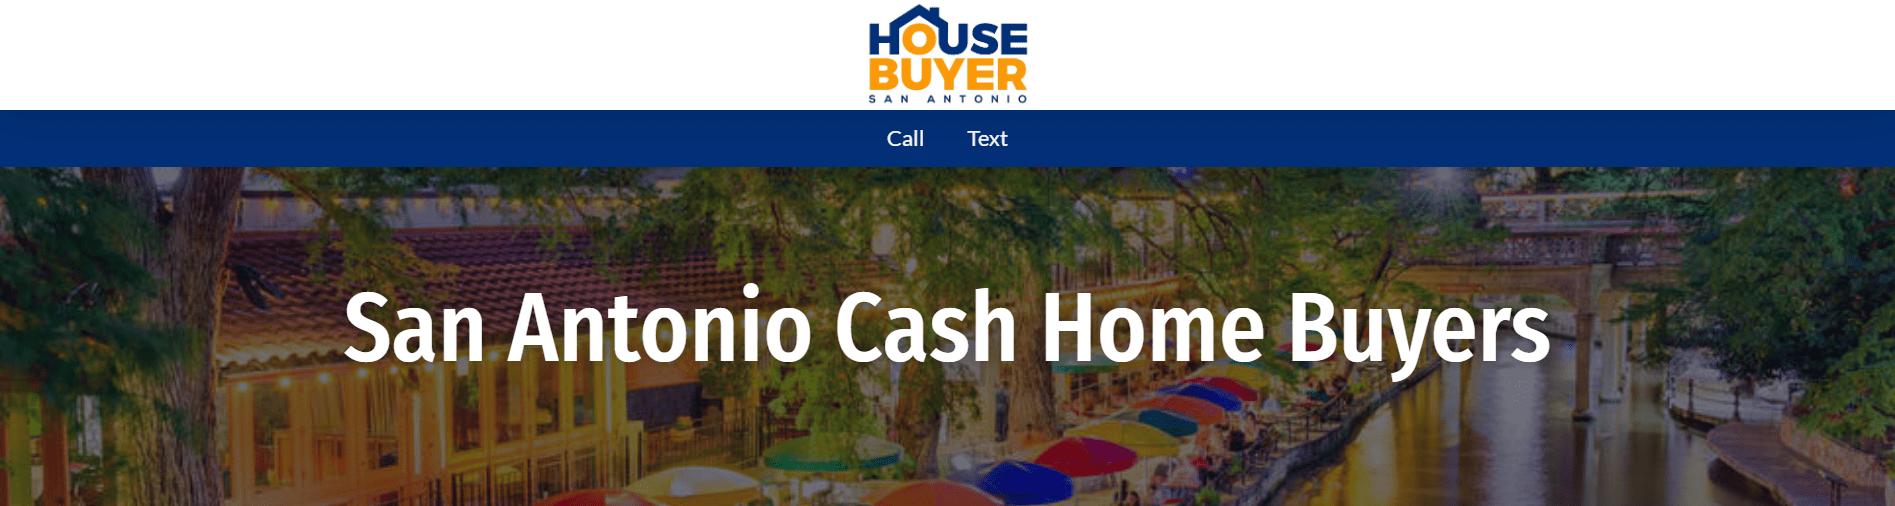 Agent immobilier San Antonio